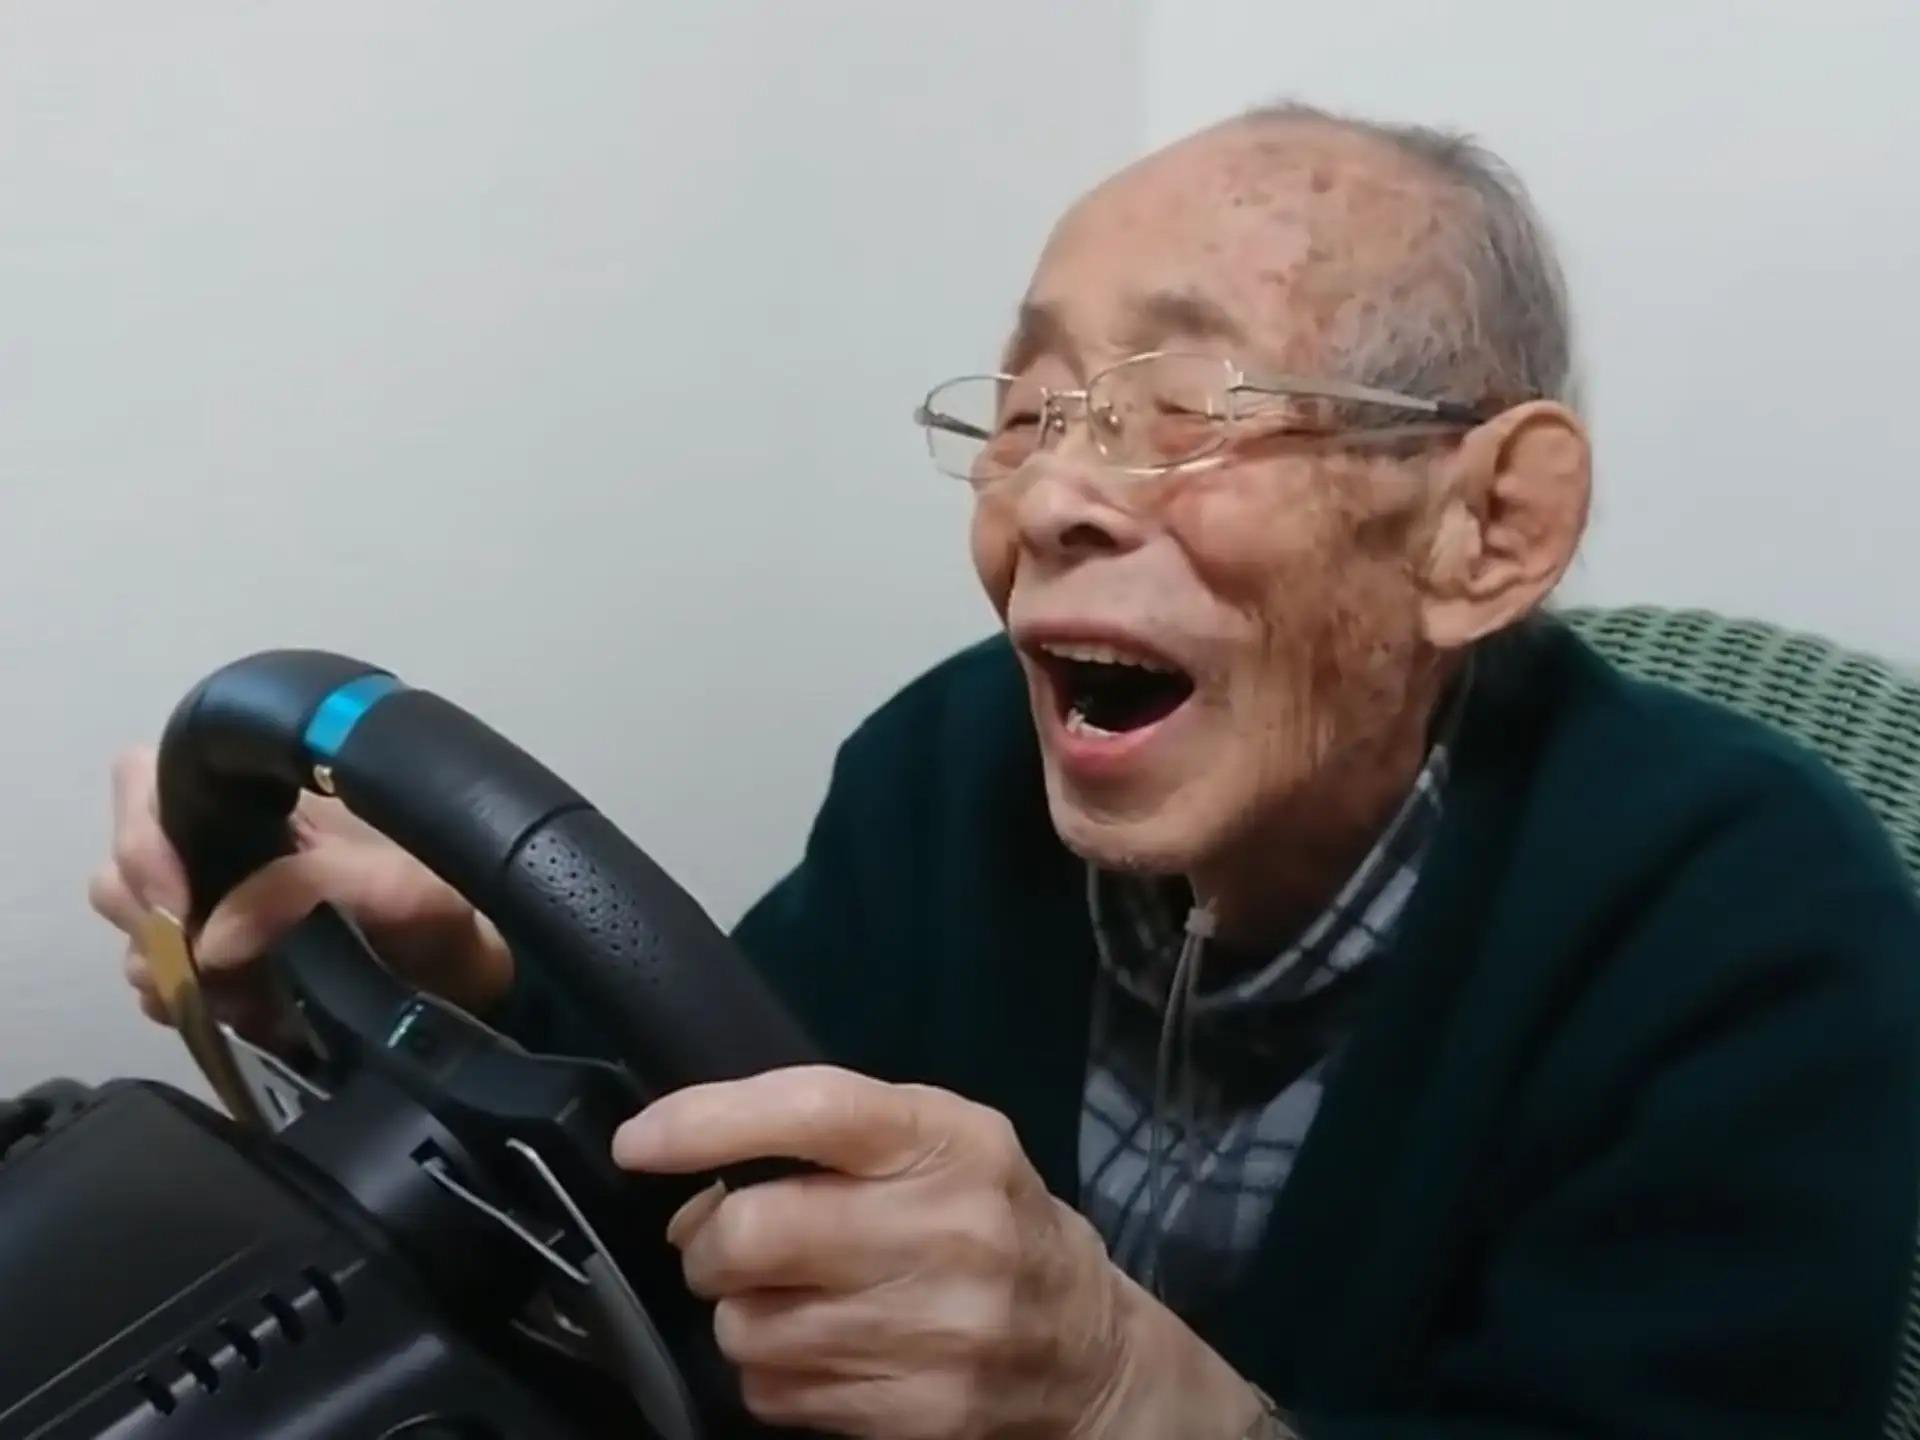 senhor japones jogando videogame